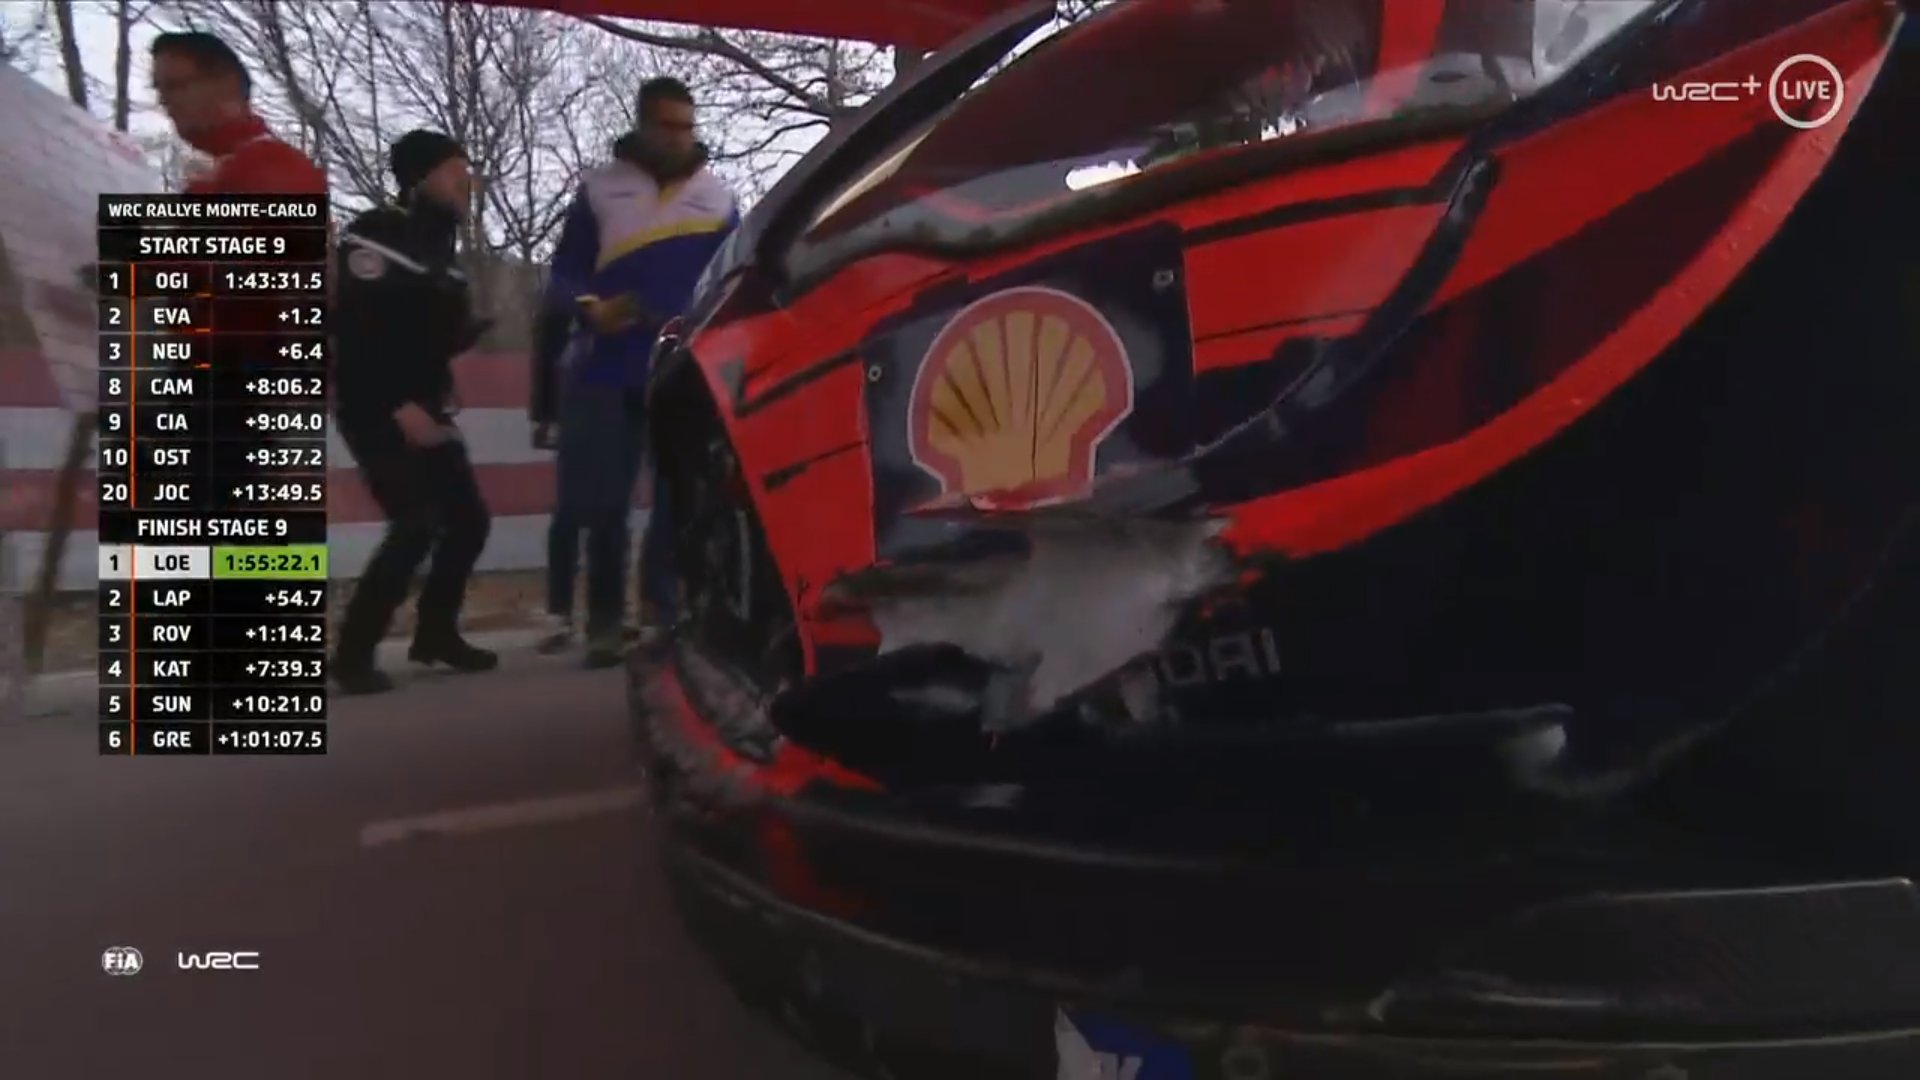 WRC: 88º Rallye Automobile de Monte-Carlo [20-26 de Enero] - Página 10 EPHZtPgXkAErZyA?format=jpg&name=large